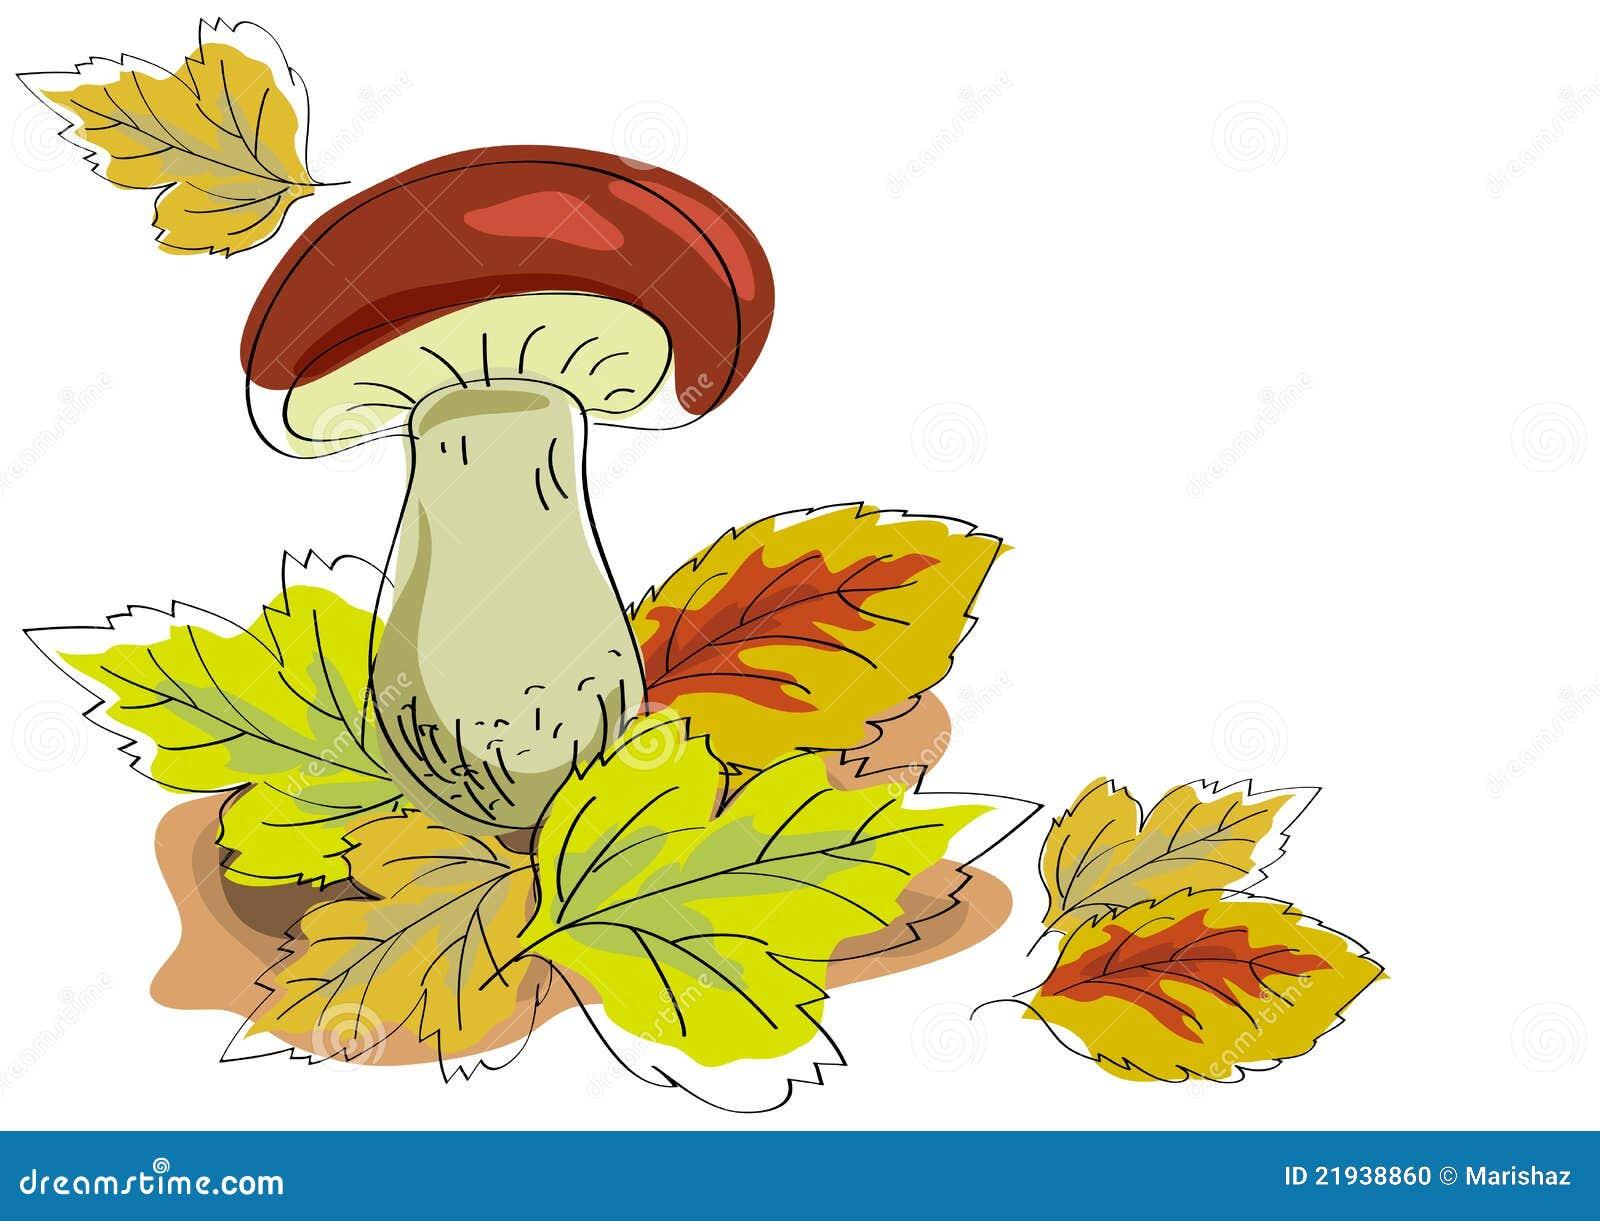 Рисунок осень гриб